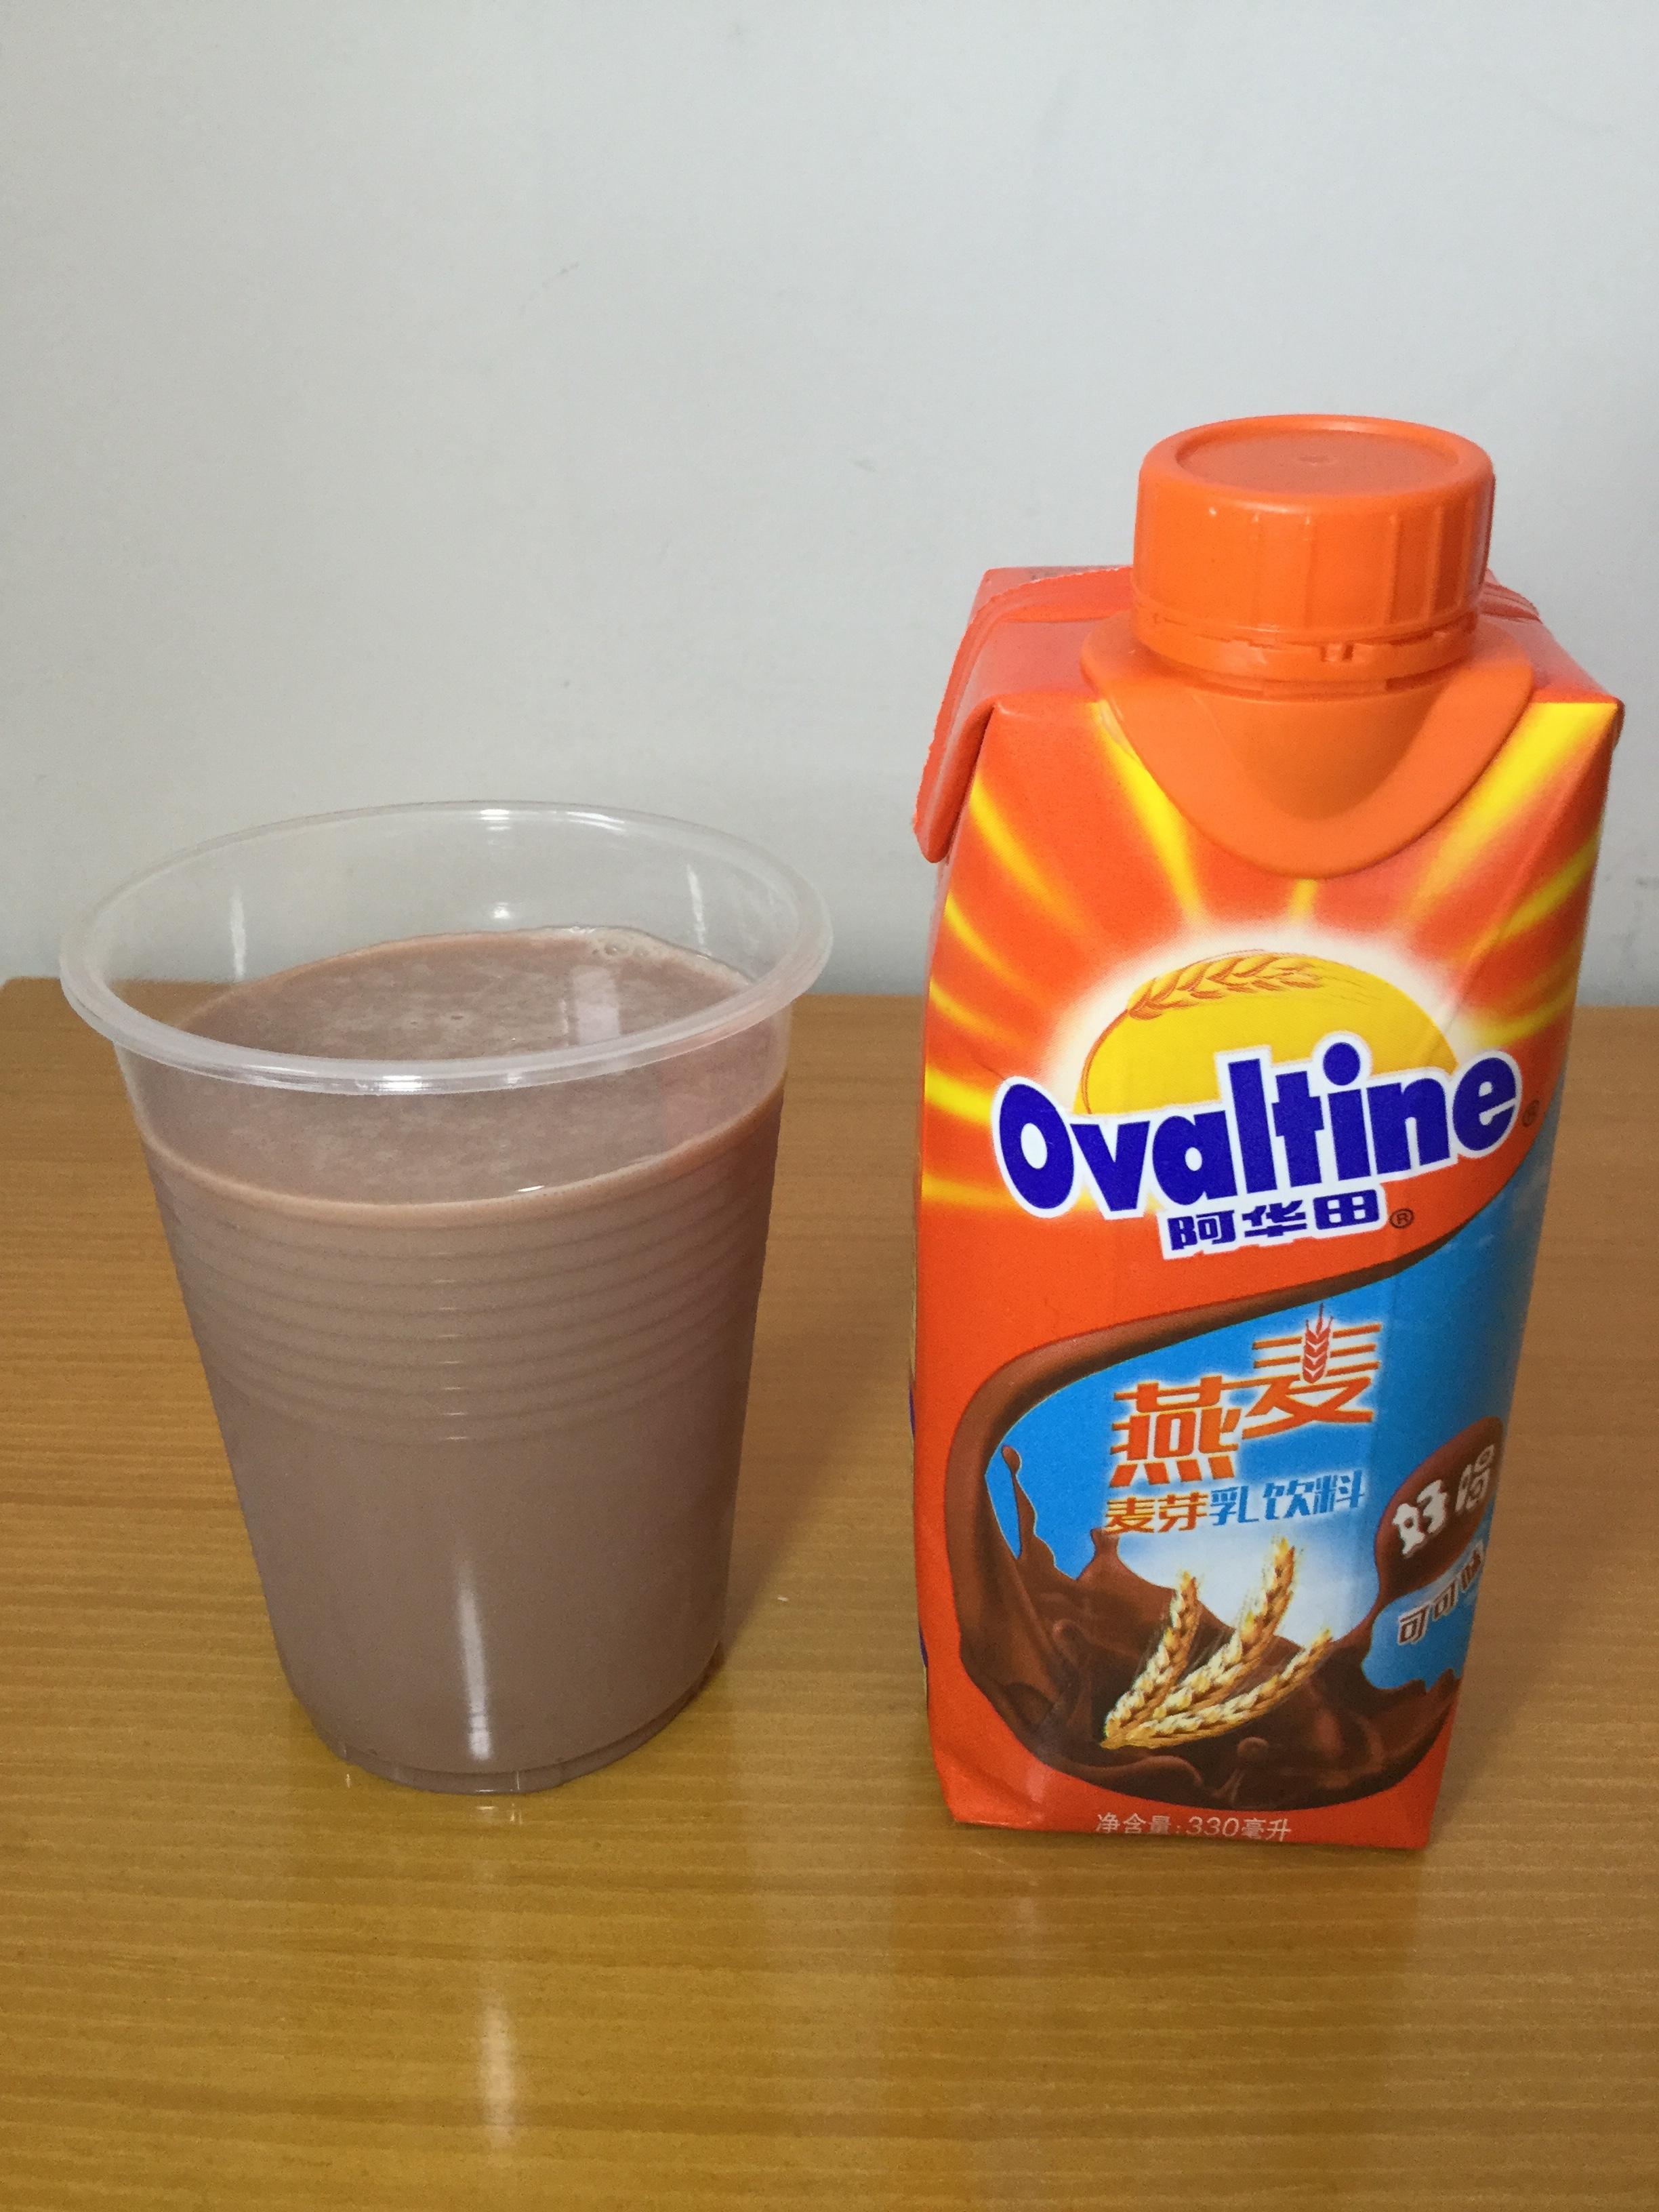 Ovaltine Malt Milk Cup